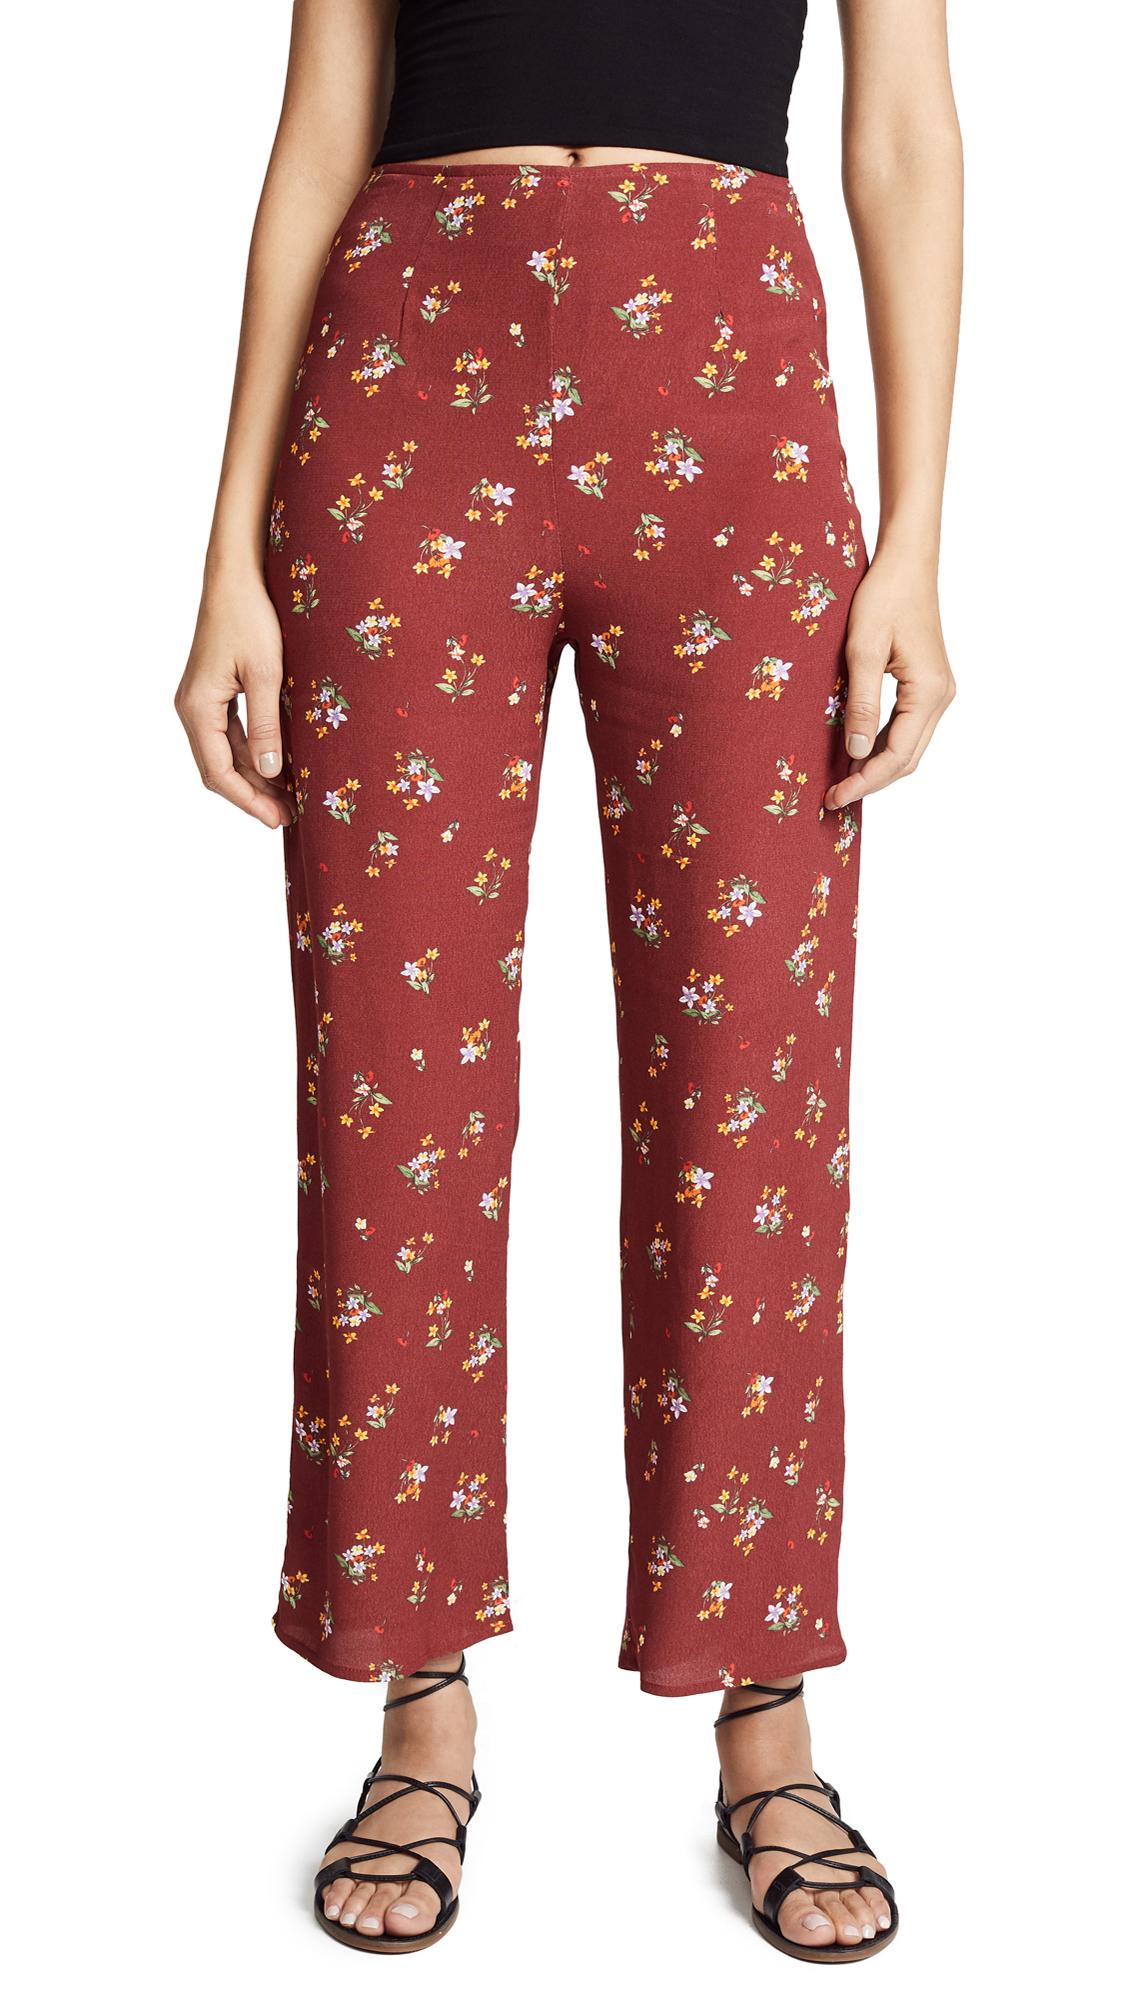 Flynn Skye Parker Pants - Autumn Bunches